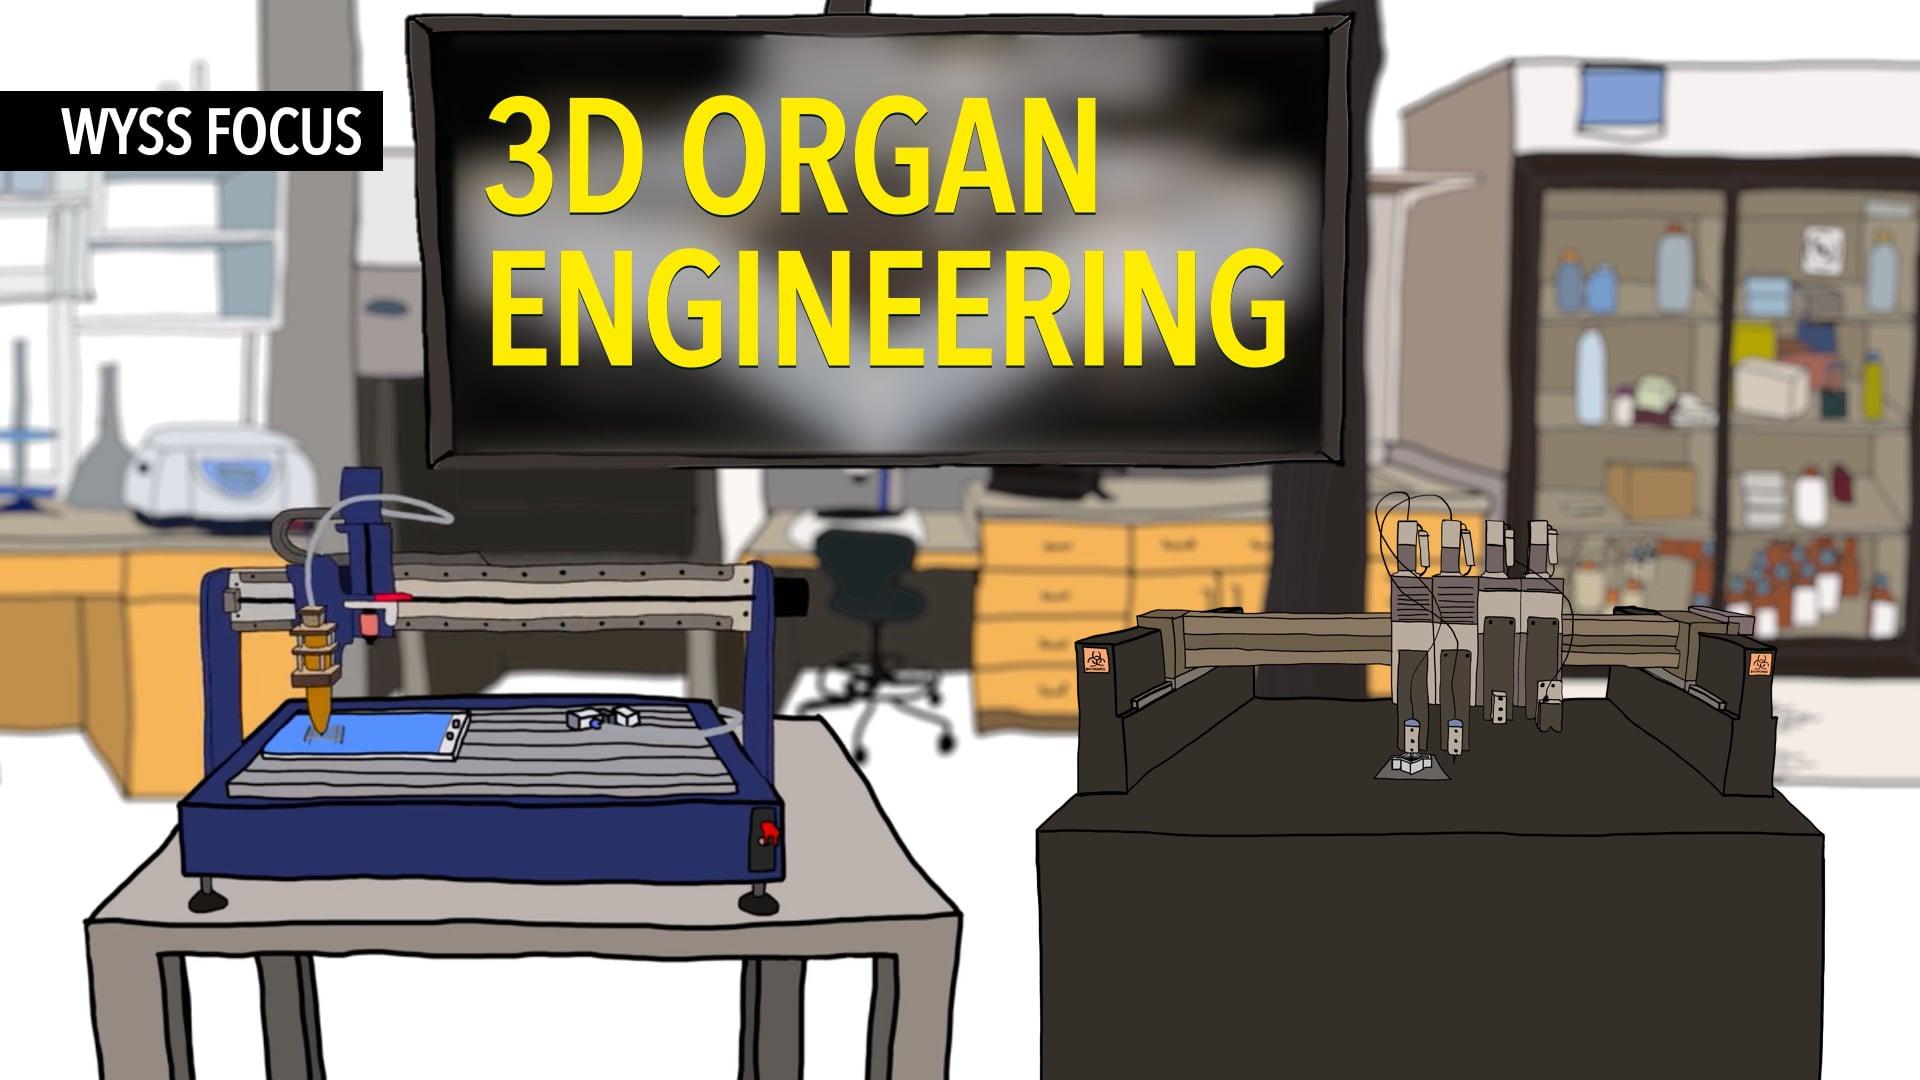 Wyss Focus: 3D Organ Engineering